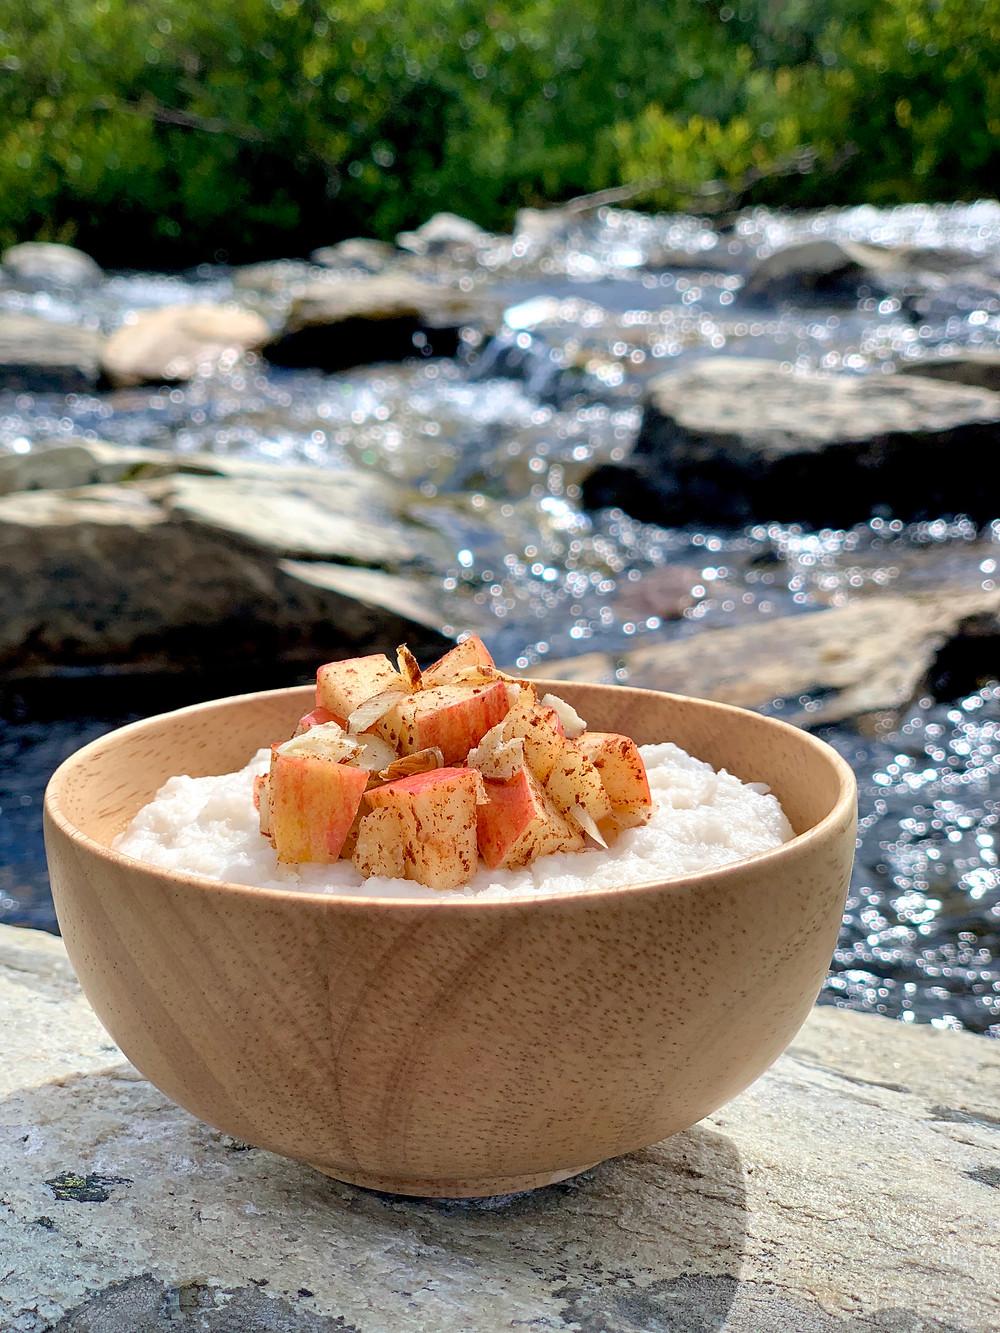 Vegansk lynhurtig risengrød tilberedt i Trangia